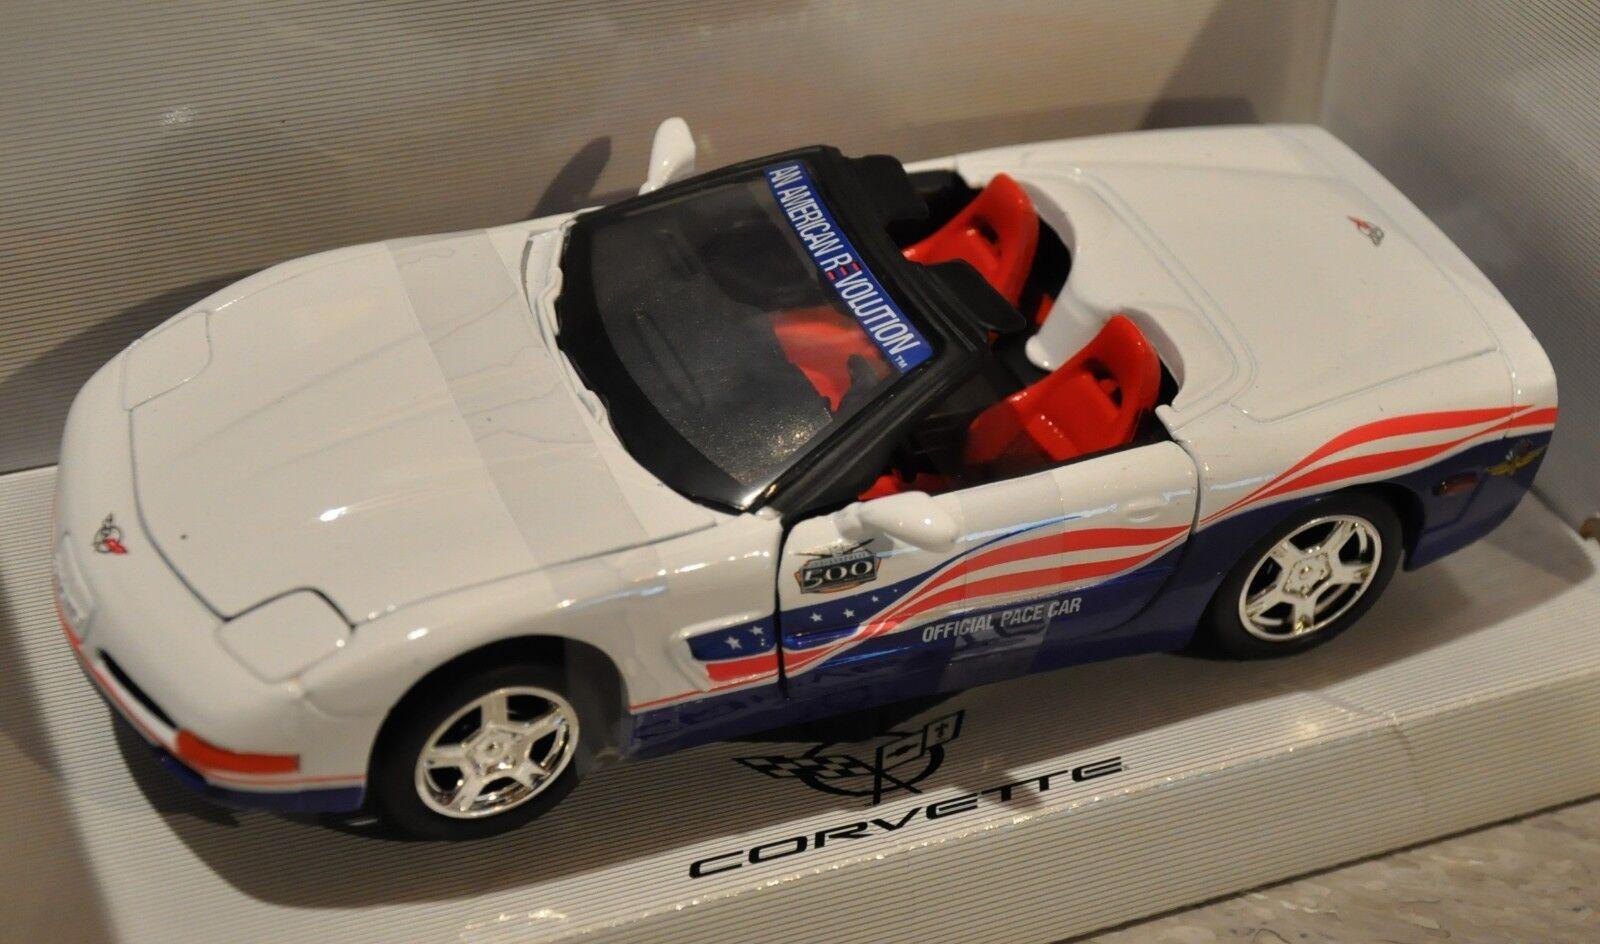 grönljus samlaibles 2004 Corvette Indy 500 Pace bil - 1 24 - röd  vit  blå